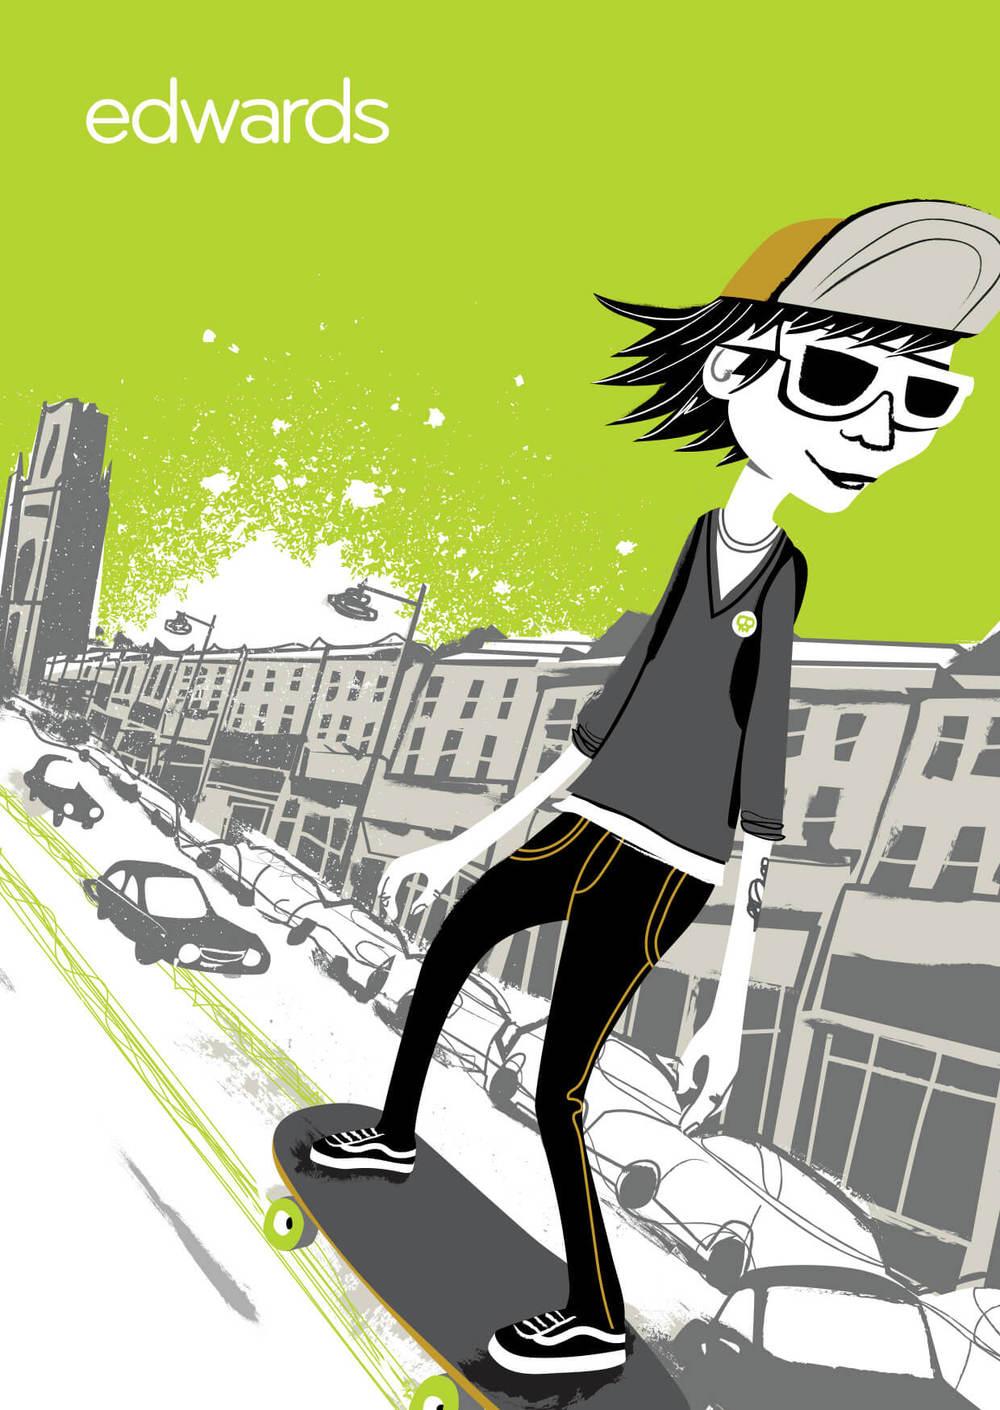 Love Bristol - Park Street Skateboarder